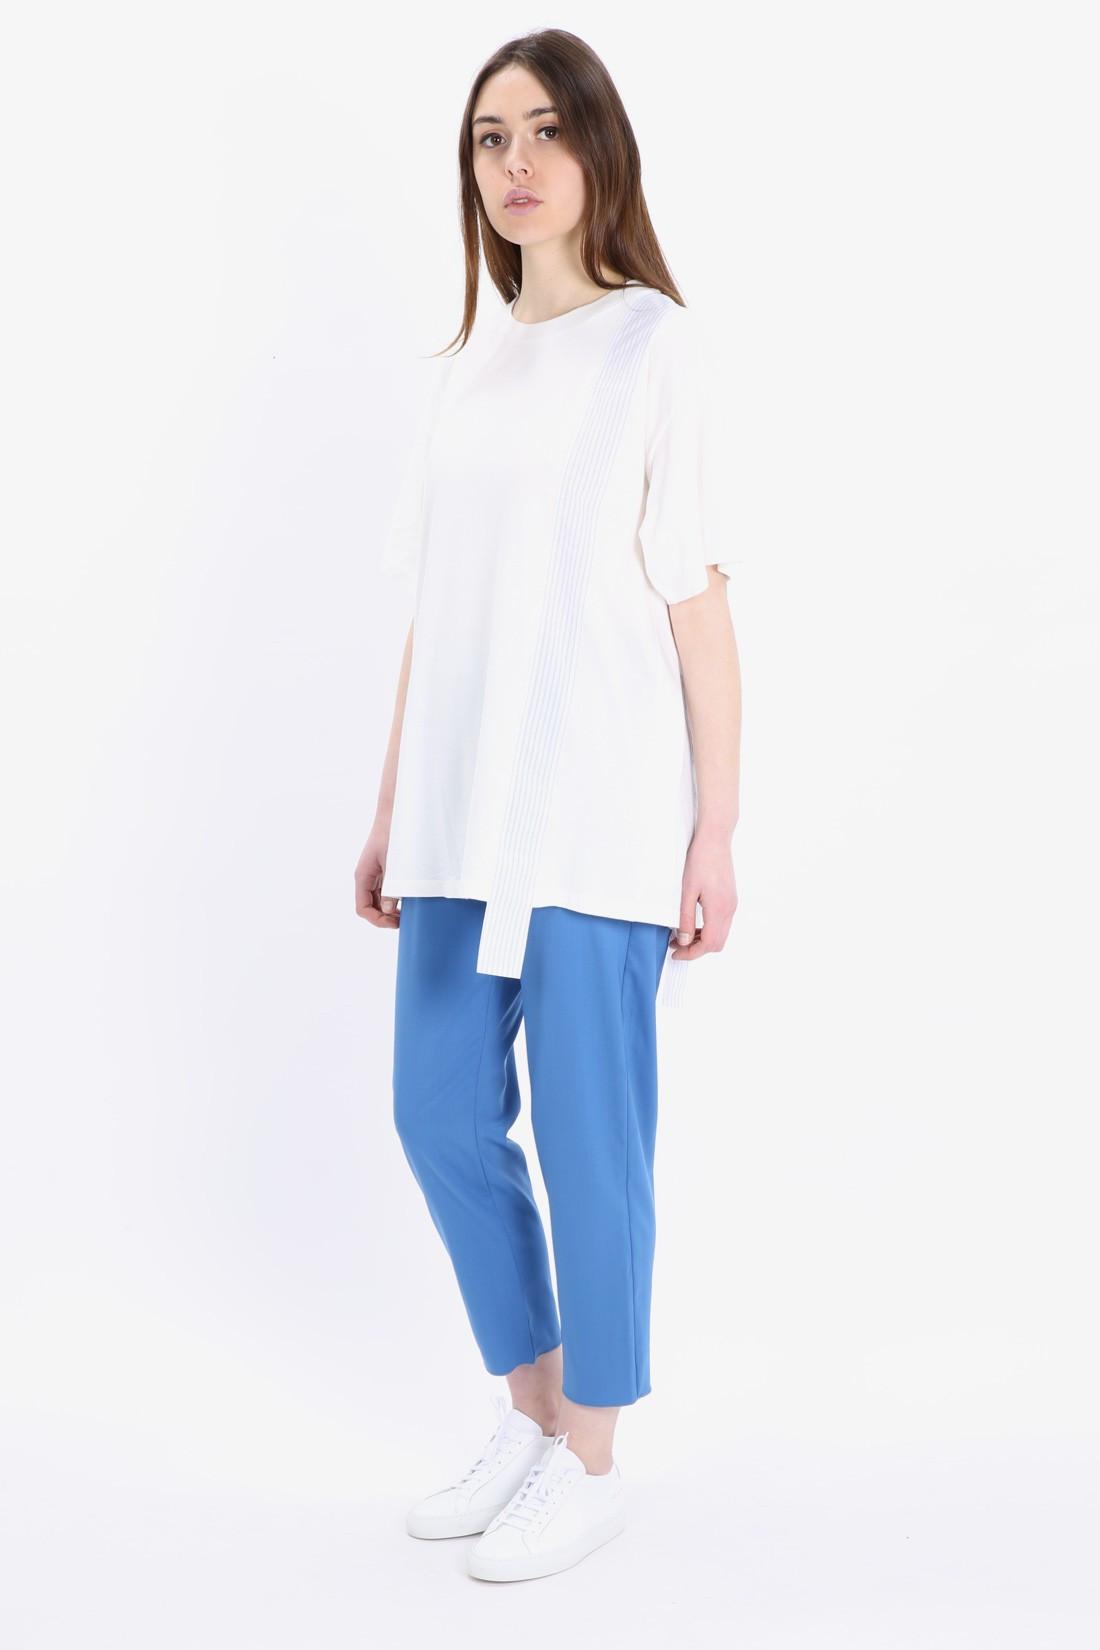 MM6 MAISON MARGIELA / T-shirt stripes left White